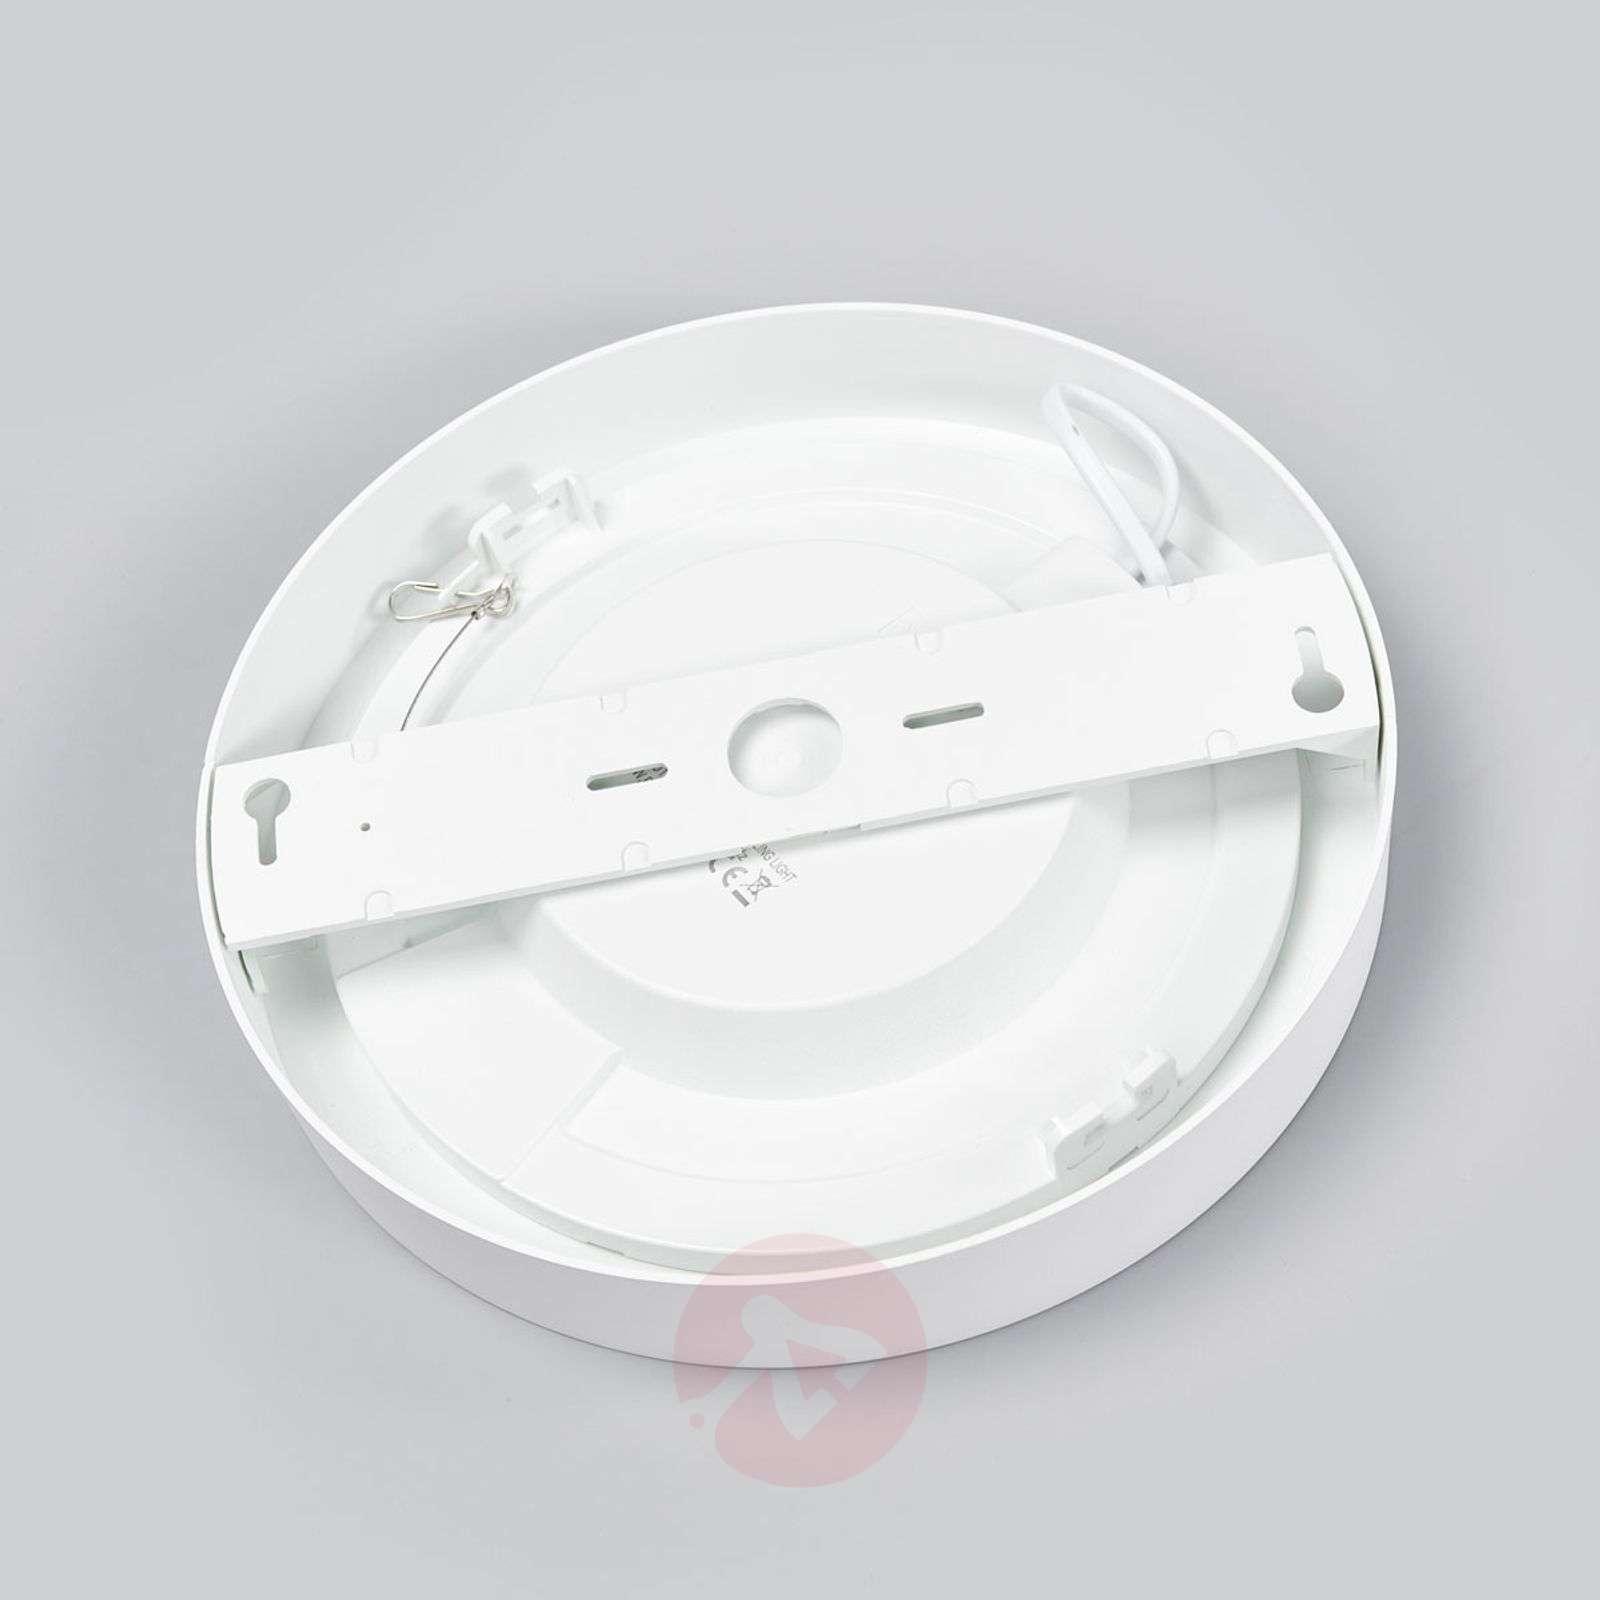 Mario powerful LED ceiling light, IP44-9978065-02